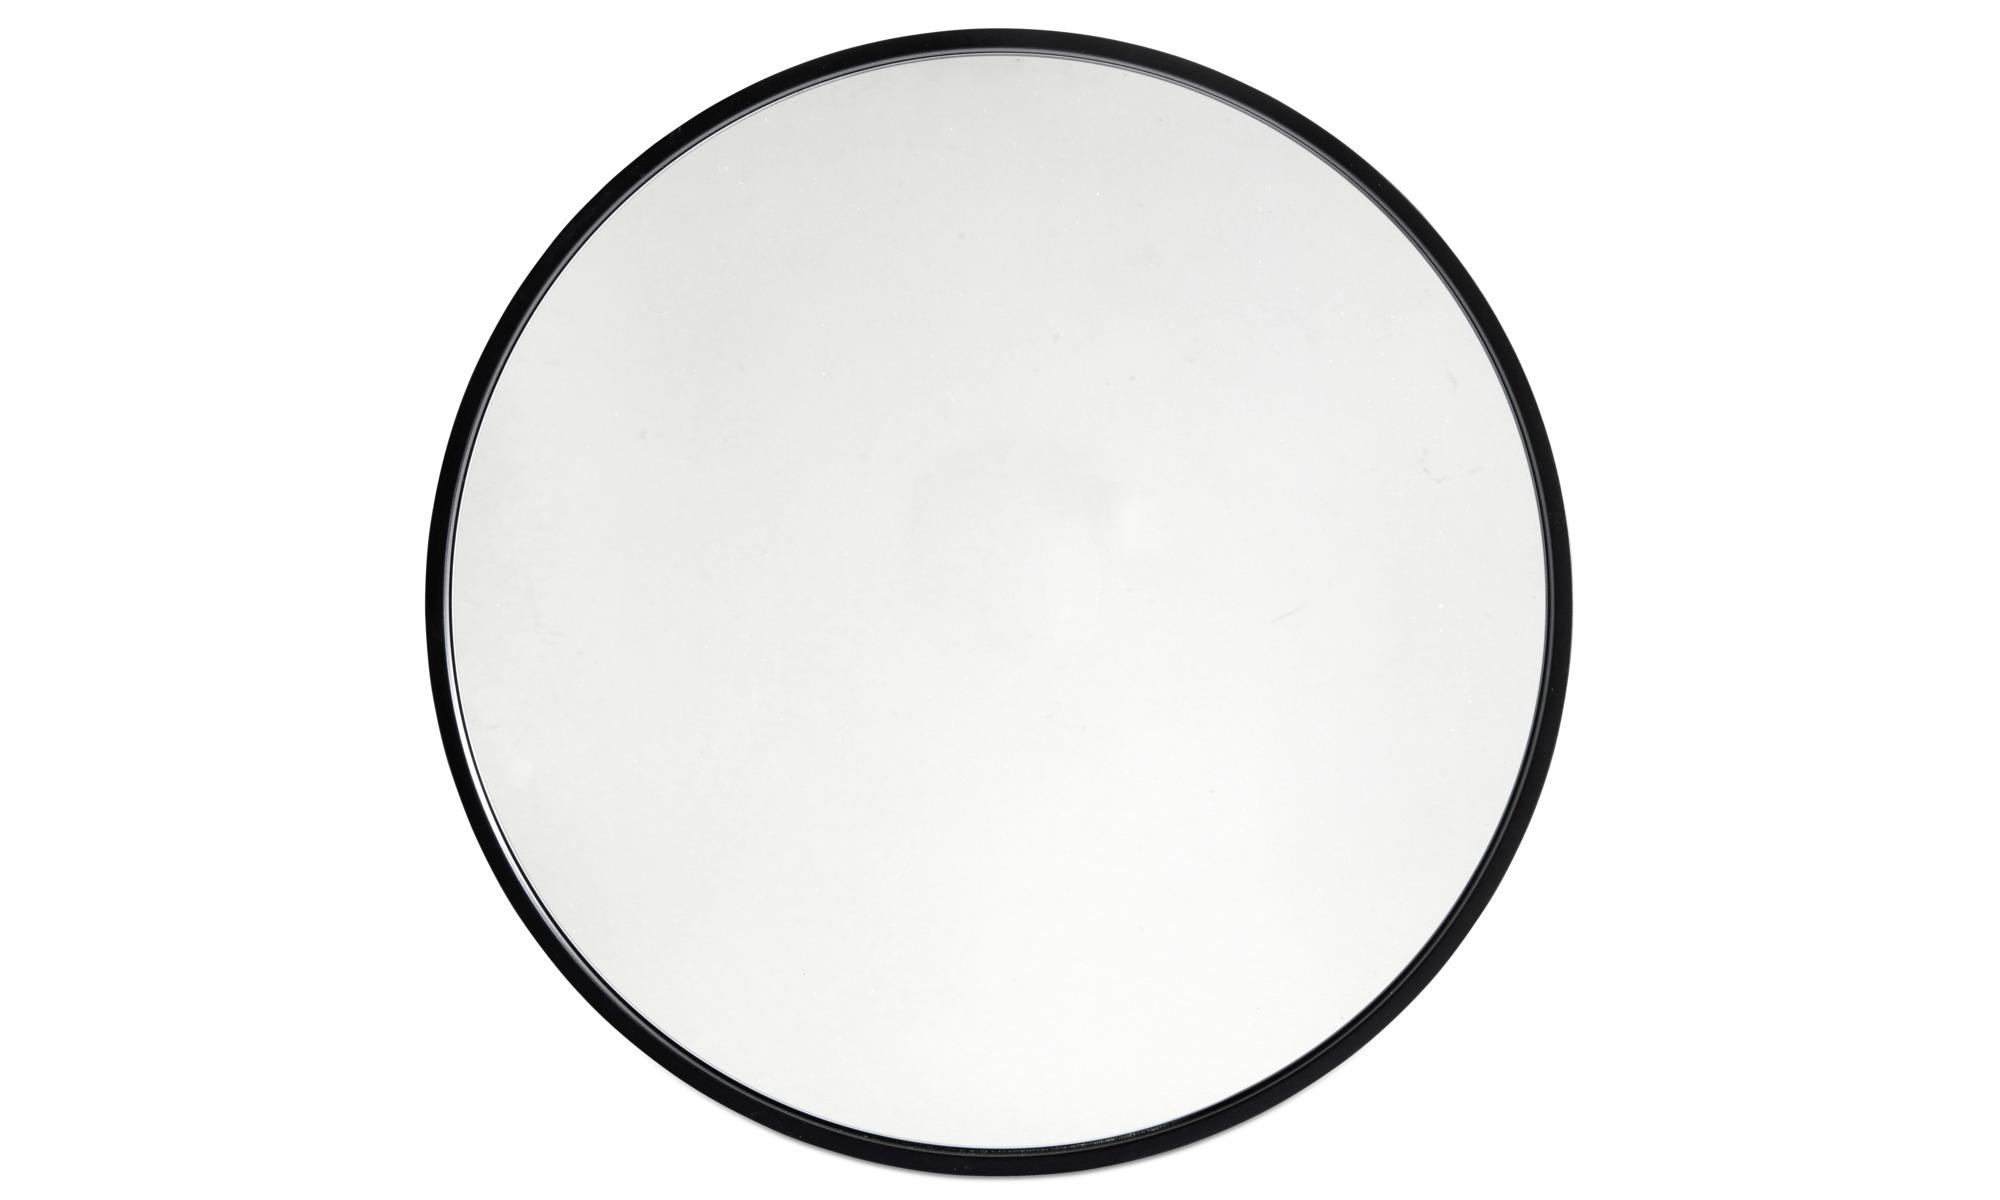 Mirrors - Ring mirror - Black - Glass